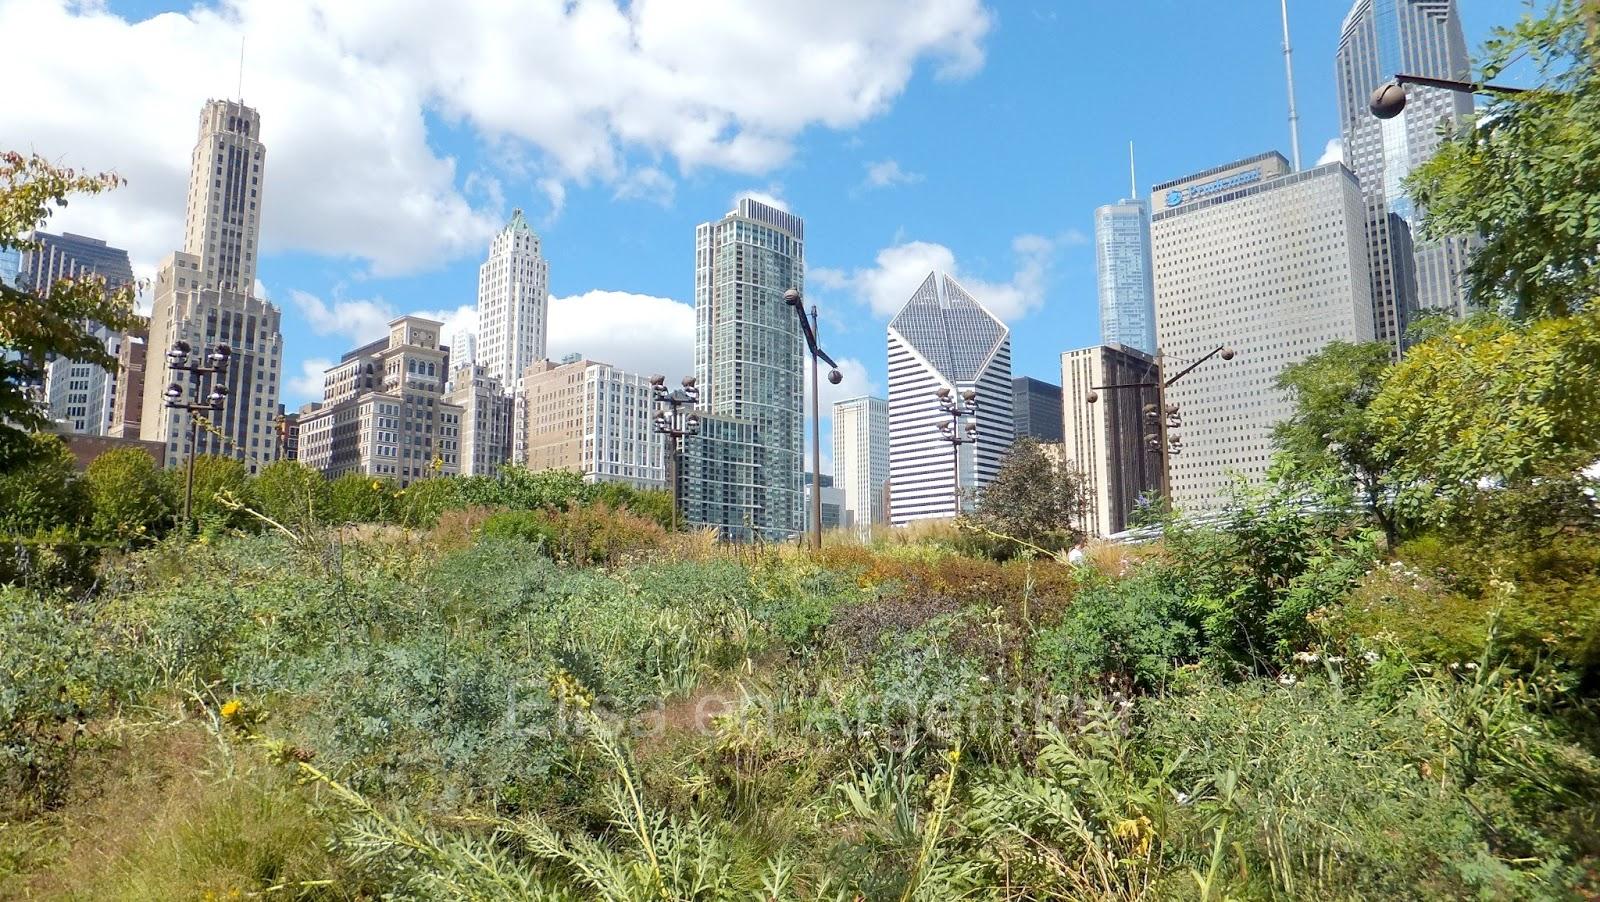 Chicago, Arquitectura, Elisa N, Blog de Viajes, Lifestyle, Travel